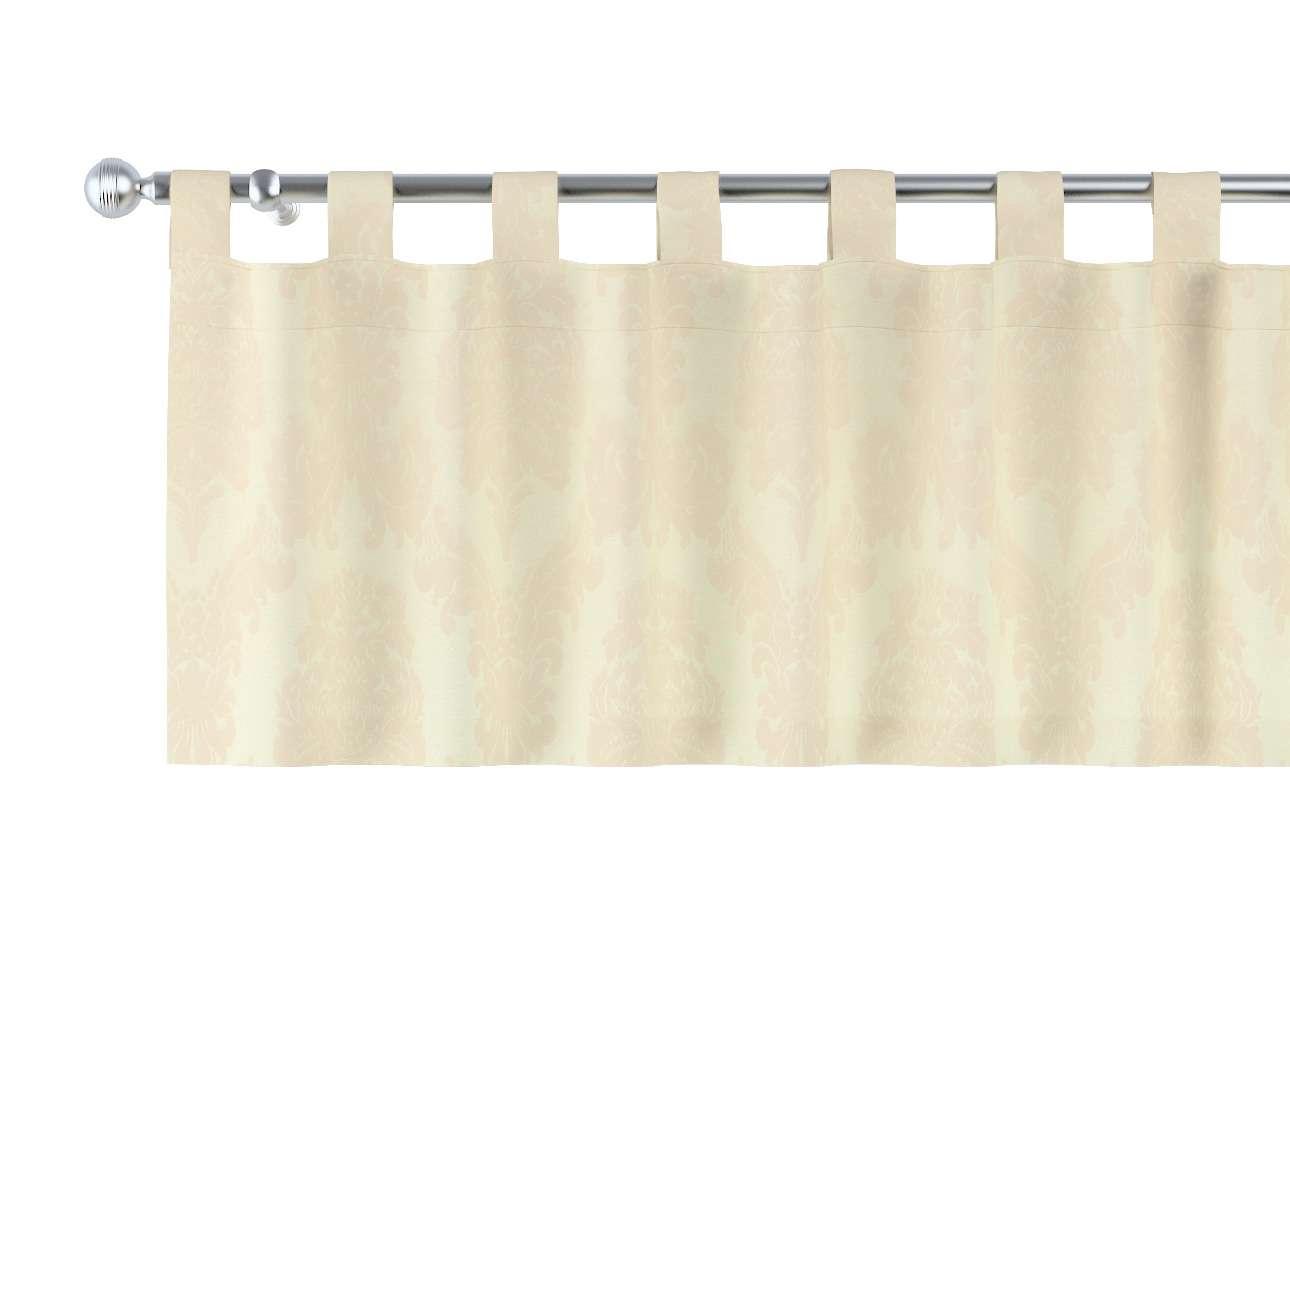 Lambrekin na szelkach 130x40cm w kolekcji Damasco, tkanina: 613-01